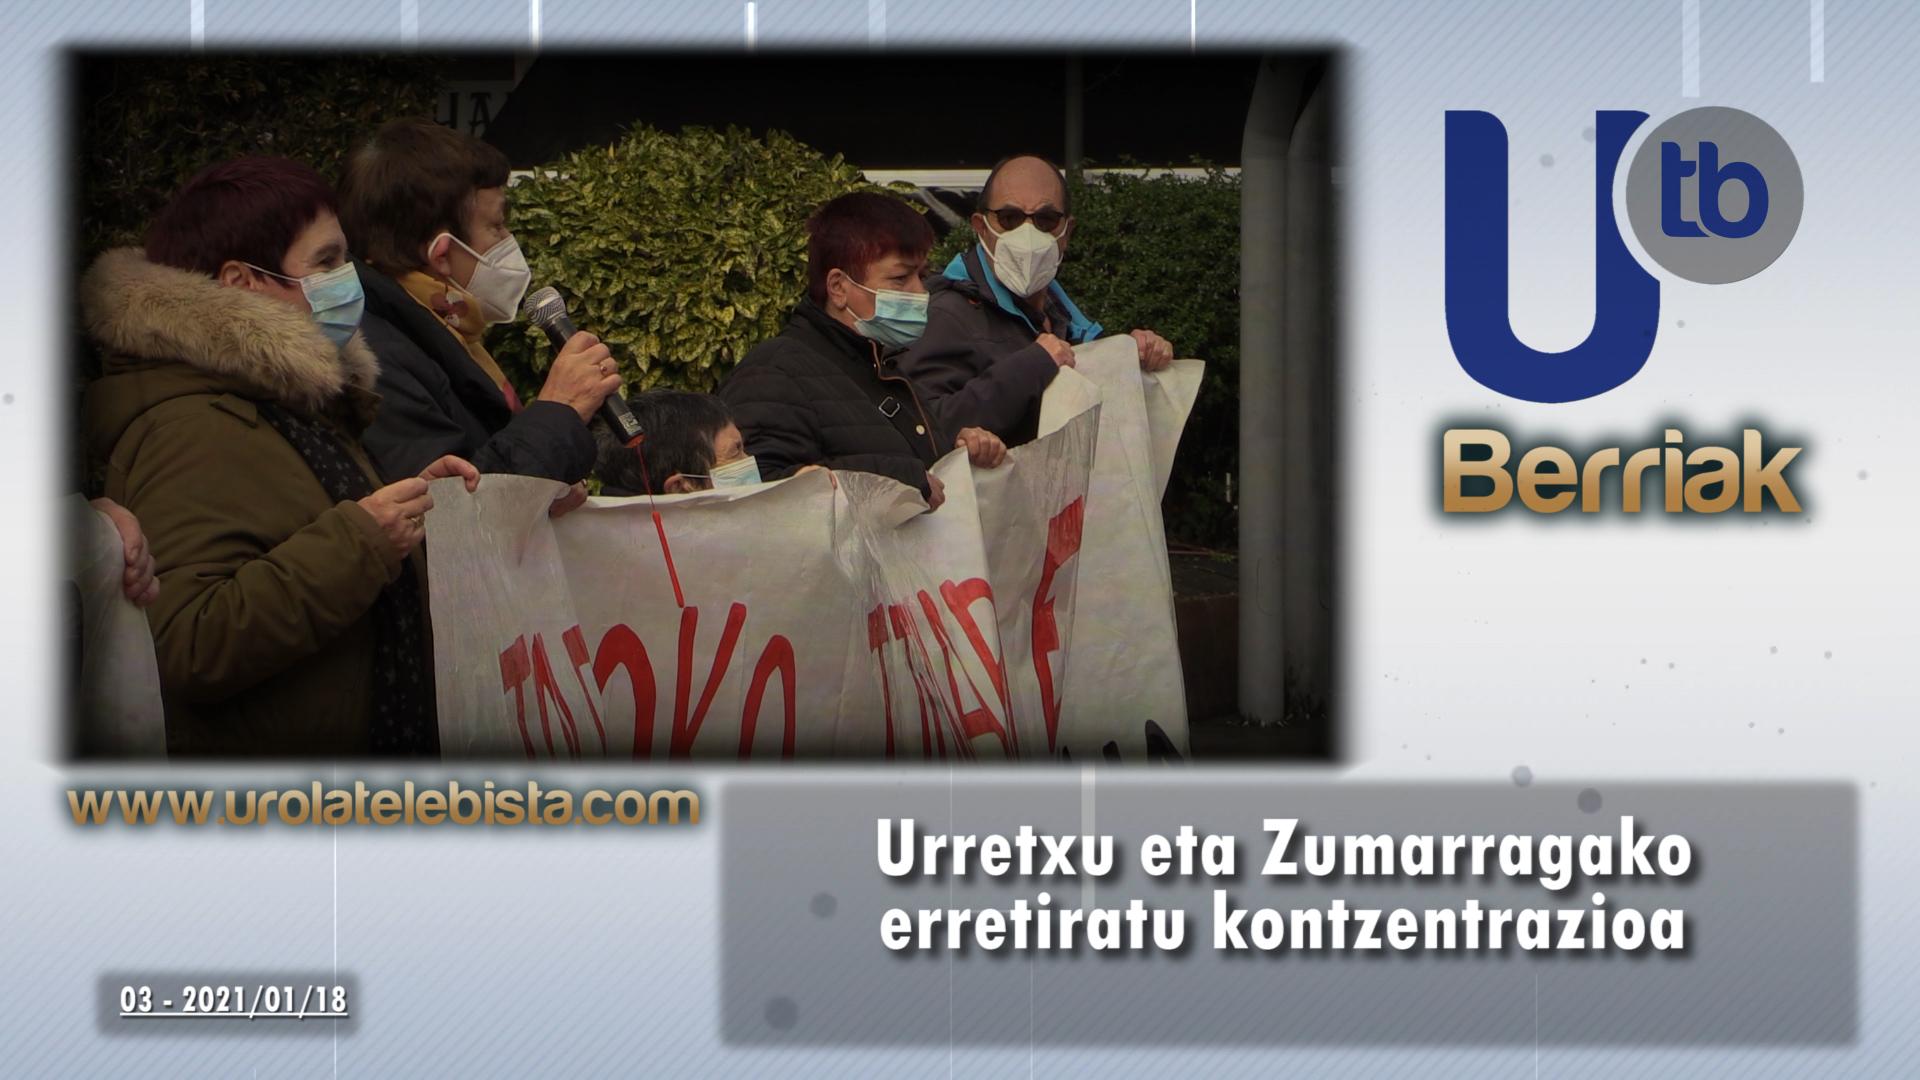 Urretxu eta Zumarragako erretiratu kontzentrazioa / Concentración de jubilados de Urretxu y Zumárraga